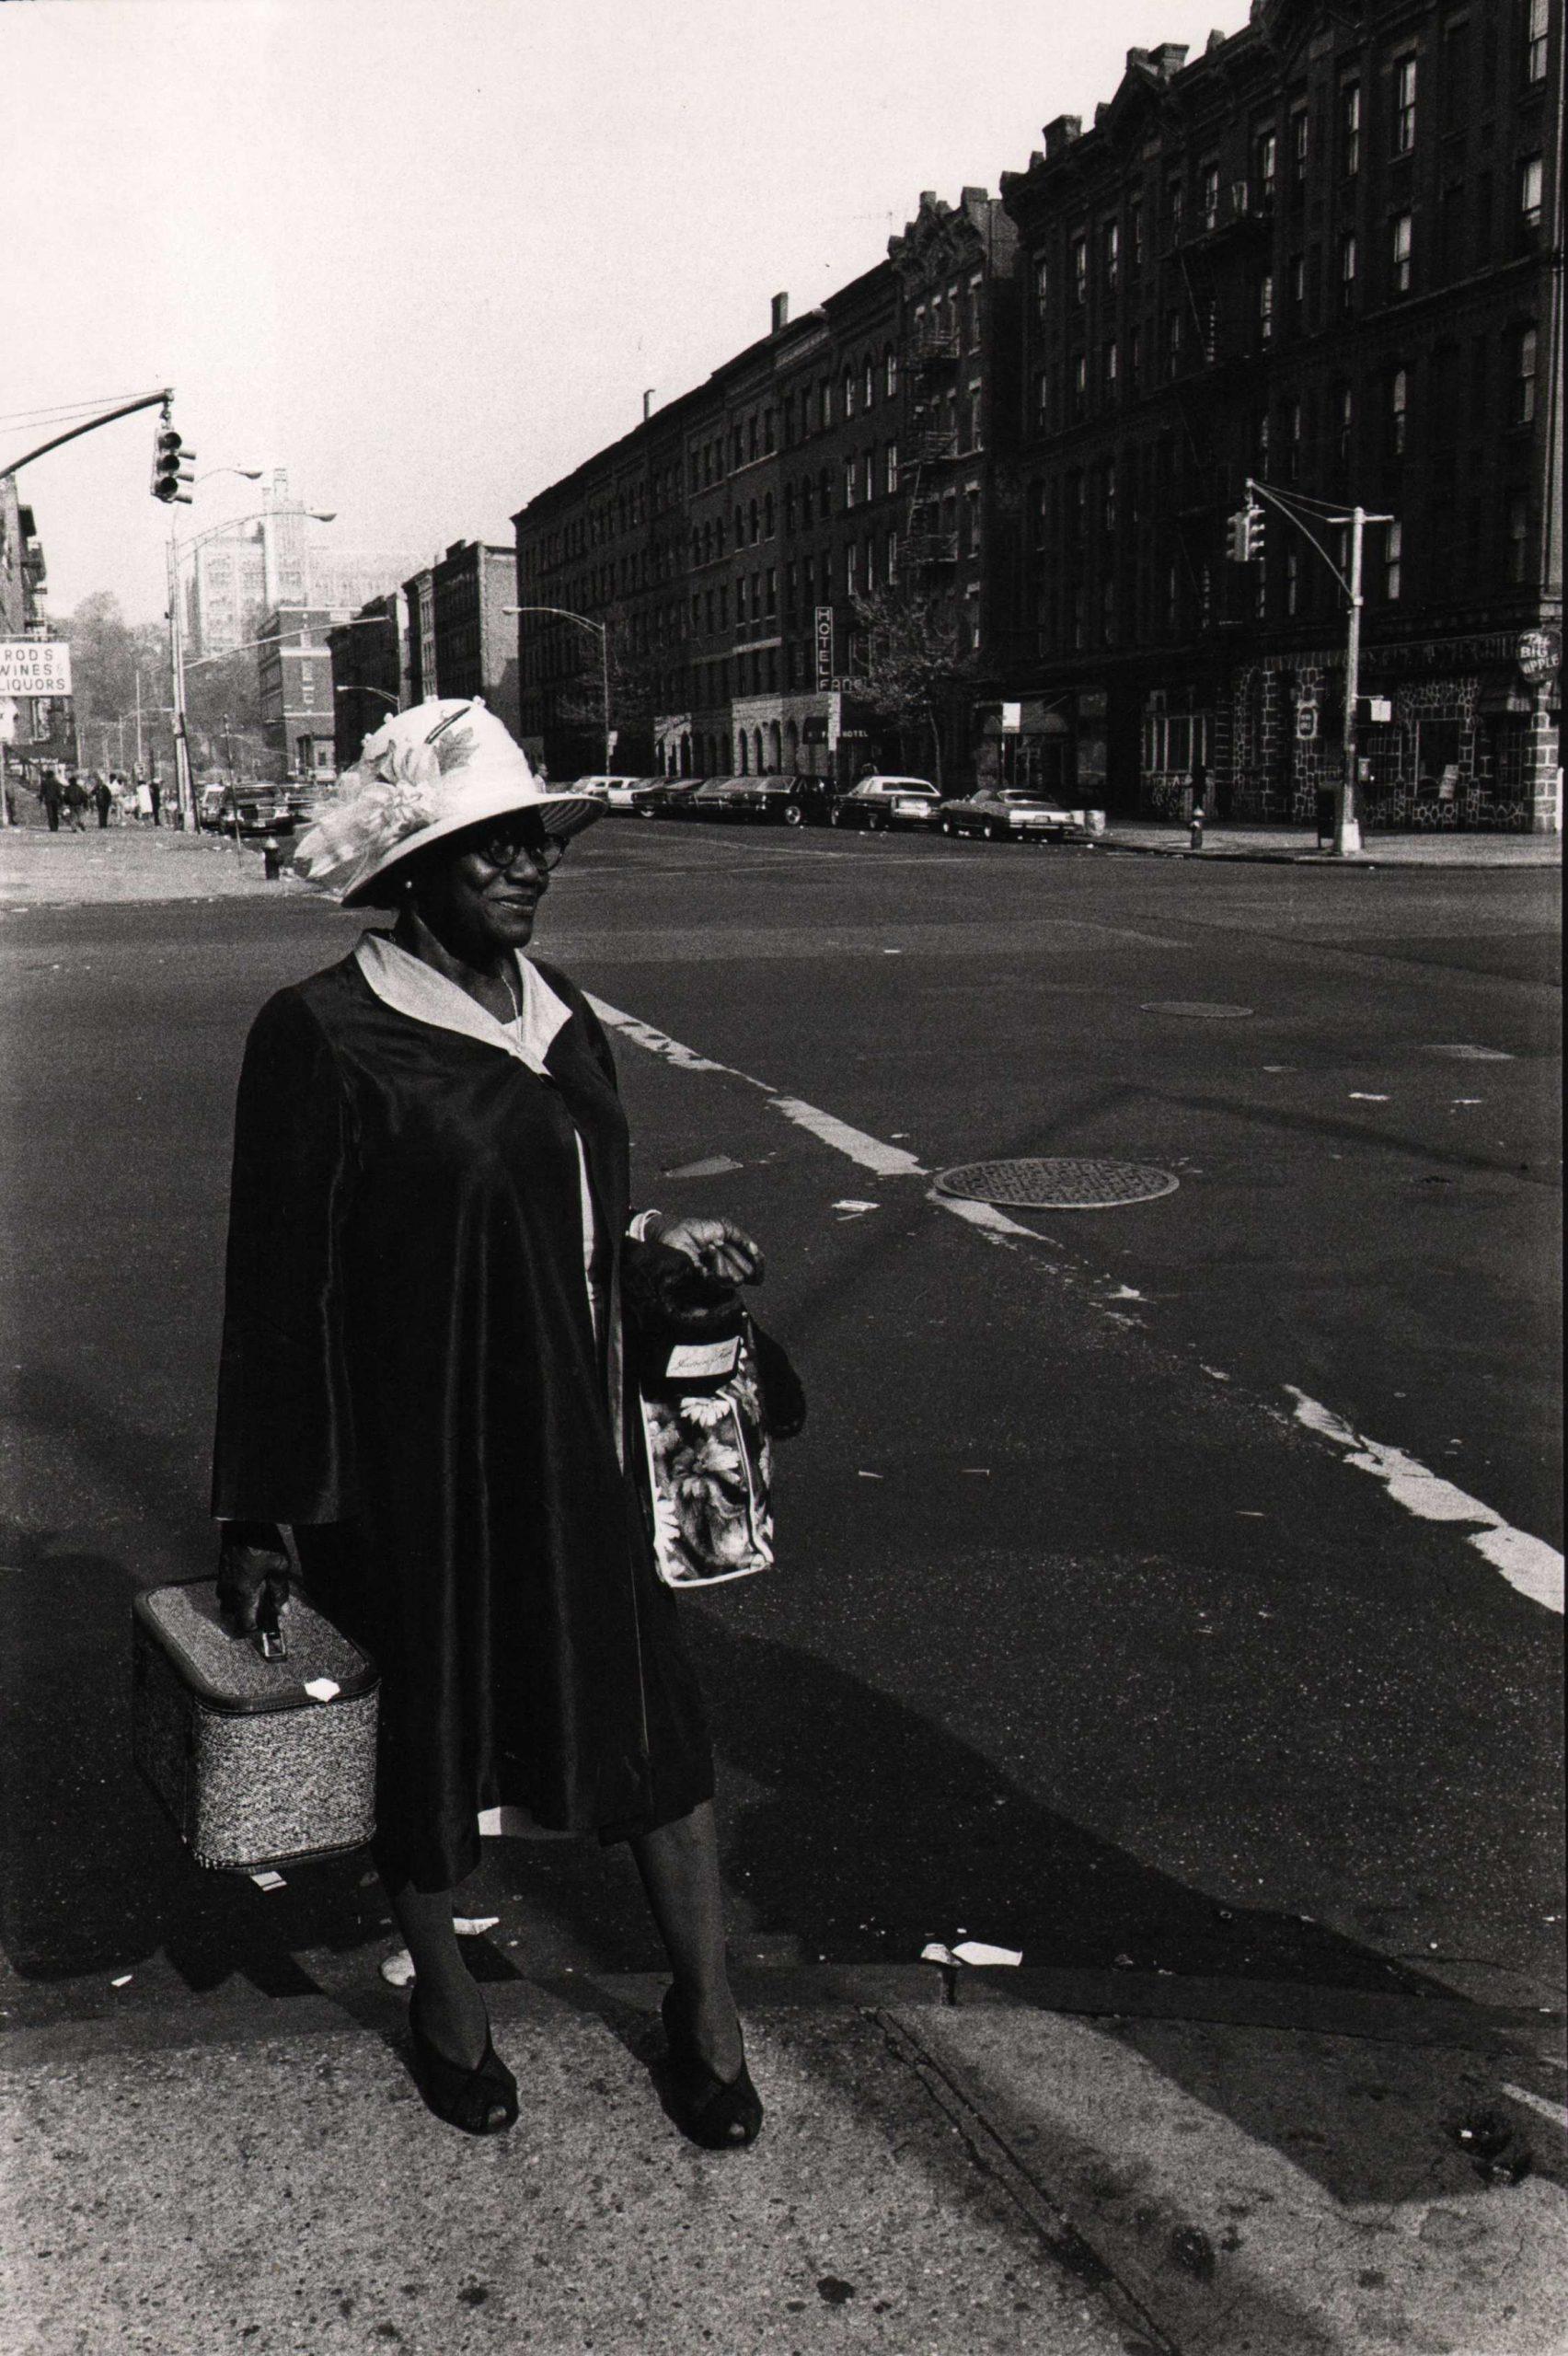 Anthony Barboza, Harlem, NY